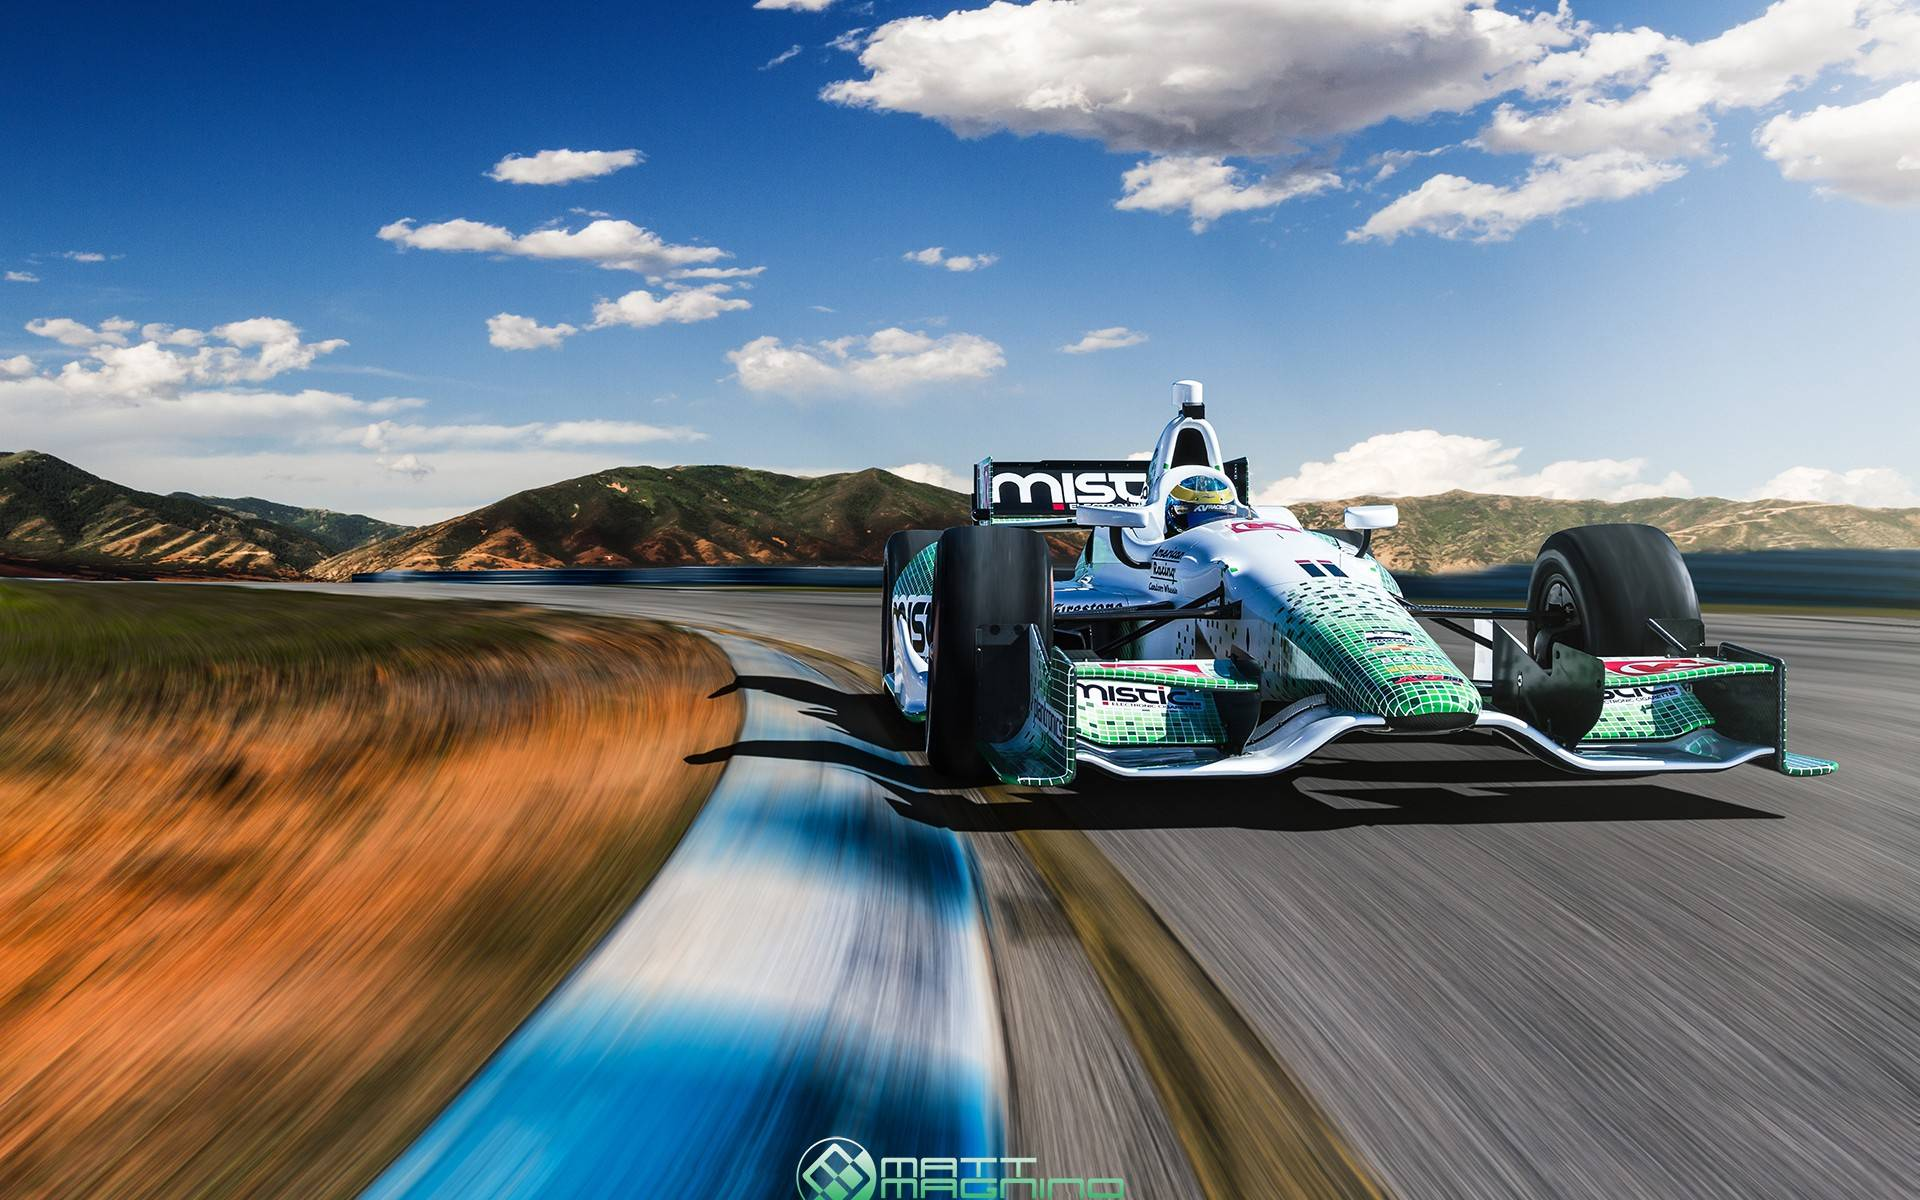 обои формула 1, F1, трасса, скорость картинки фото